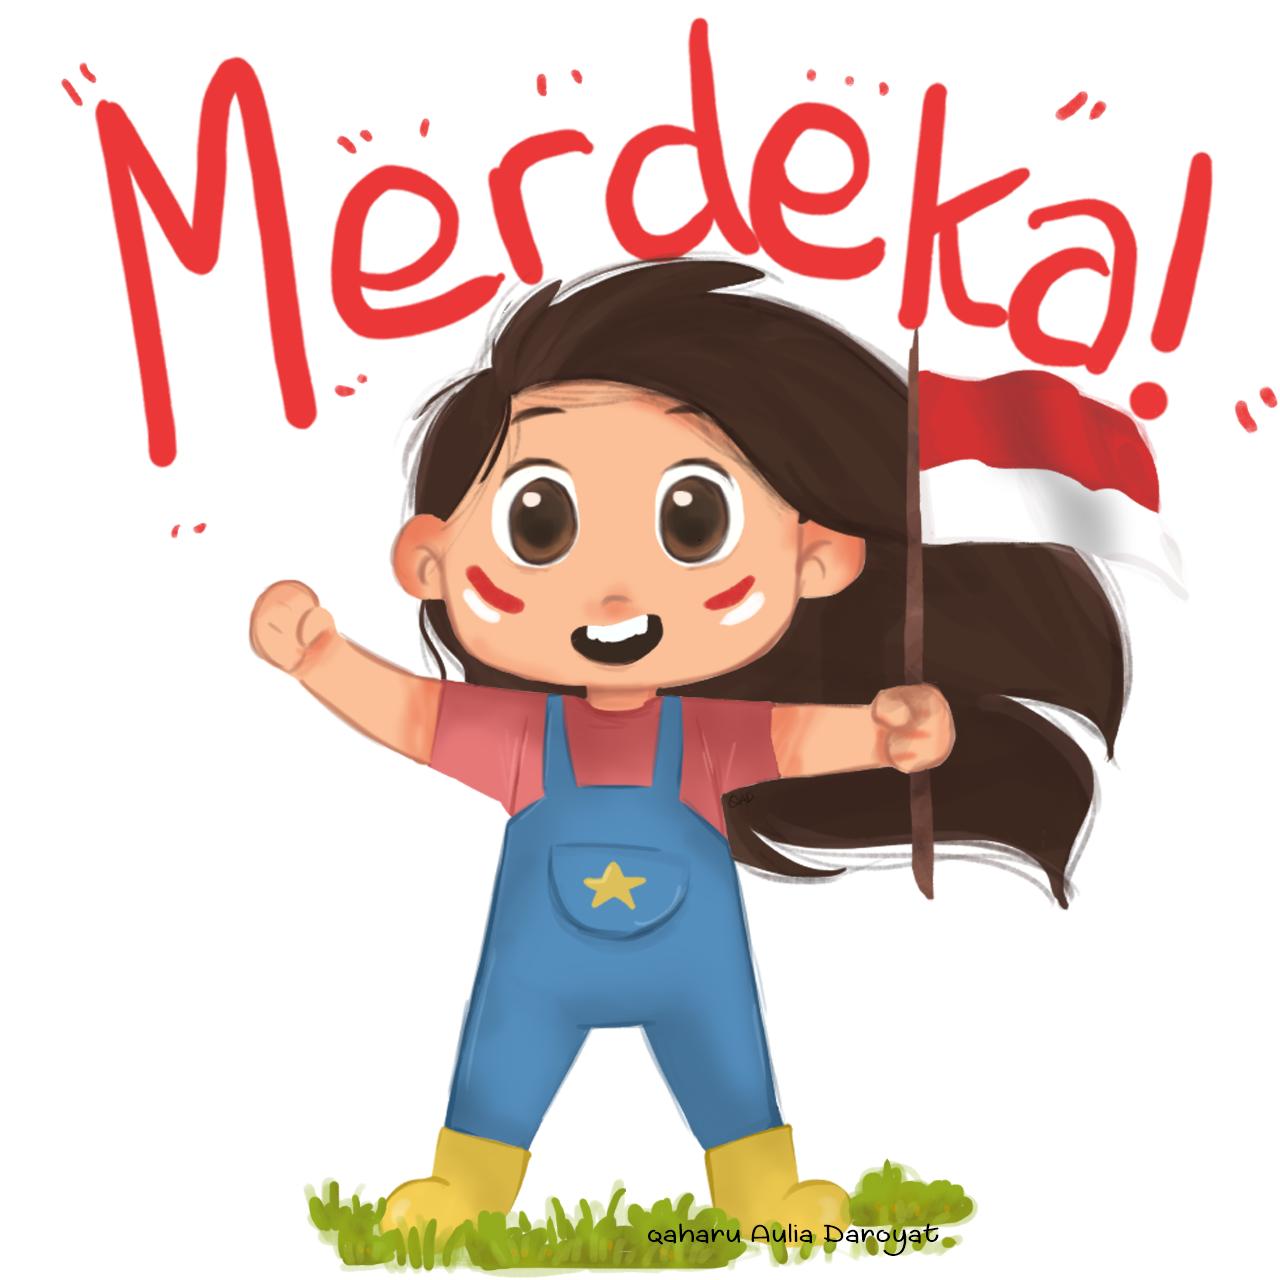 Merdeka Indonesian Independence Day Indonesian Independence Children Illustration Custom Illustration